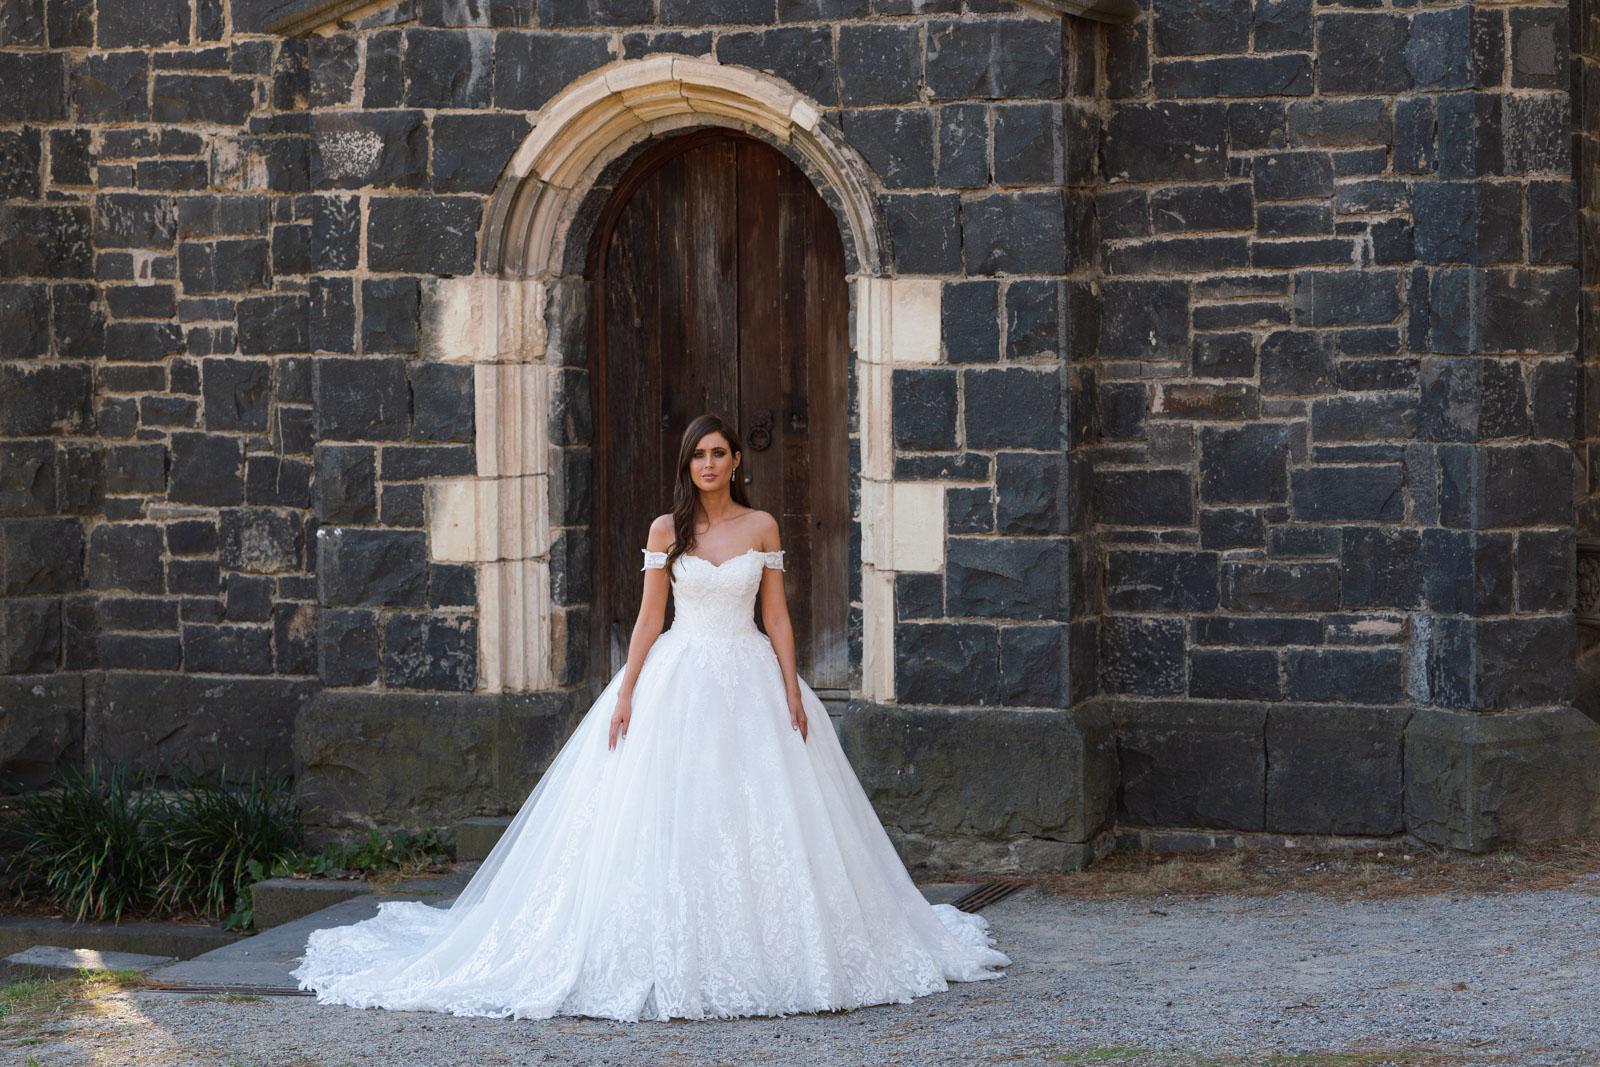 Ball Gown, Cinderella Wedding Dresses - Belle et Blanc